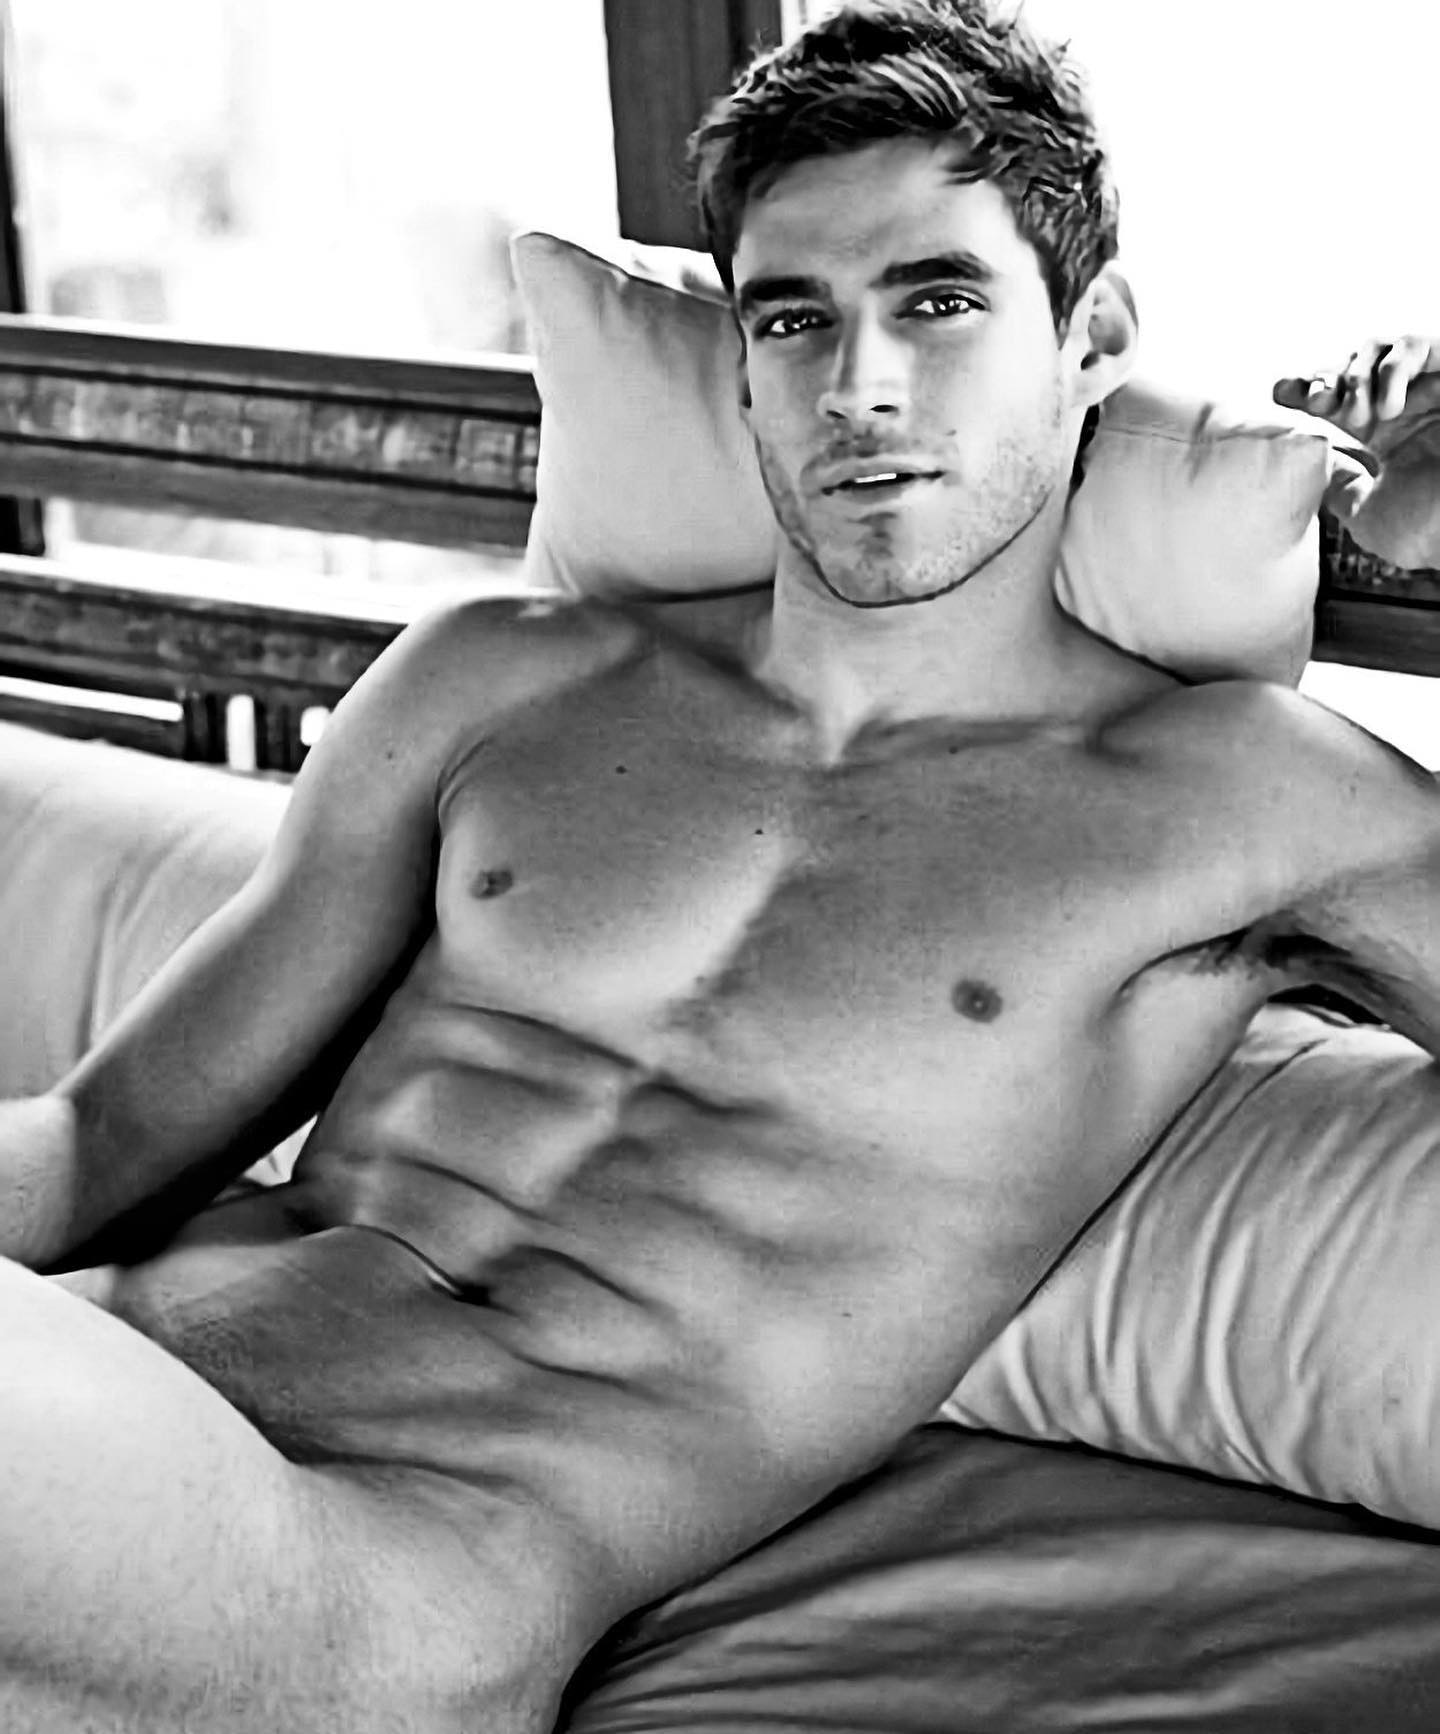 #men #blackandwhite #muscular #muscle #abs #sixpack #shirtlessguys #gaymen #hotmen #armpits #hunks